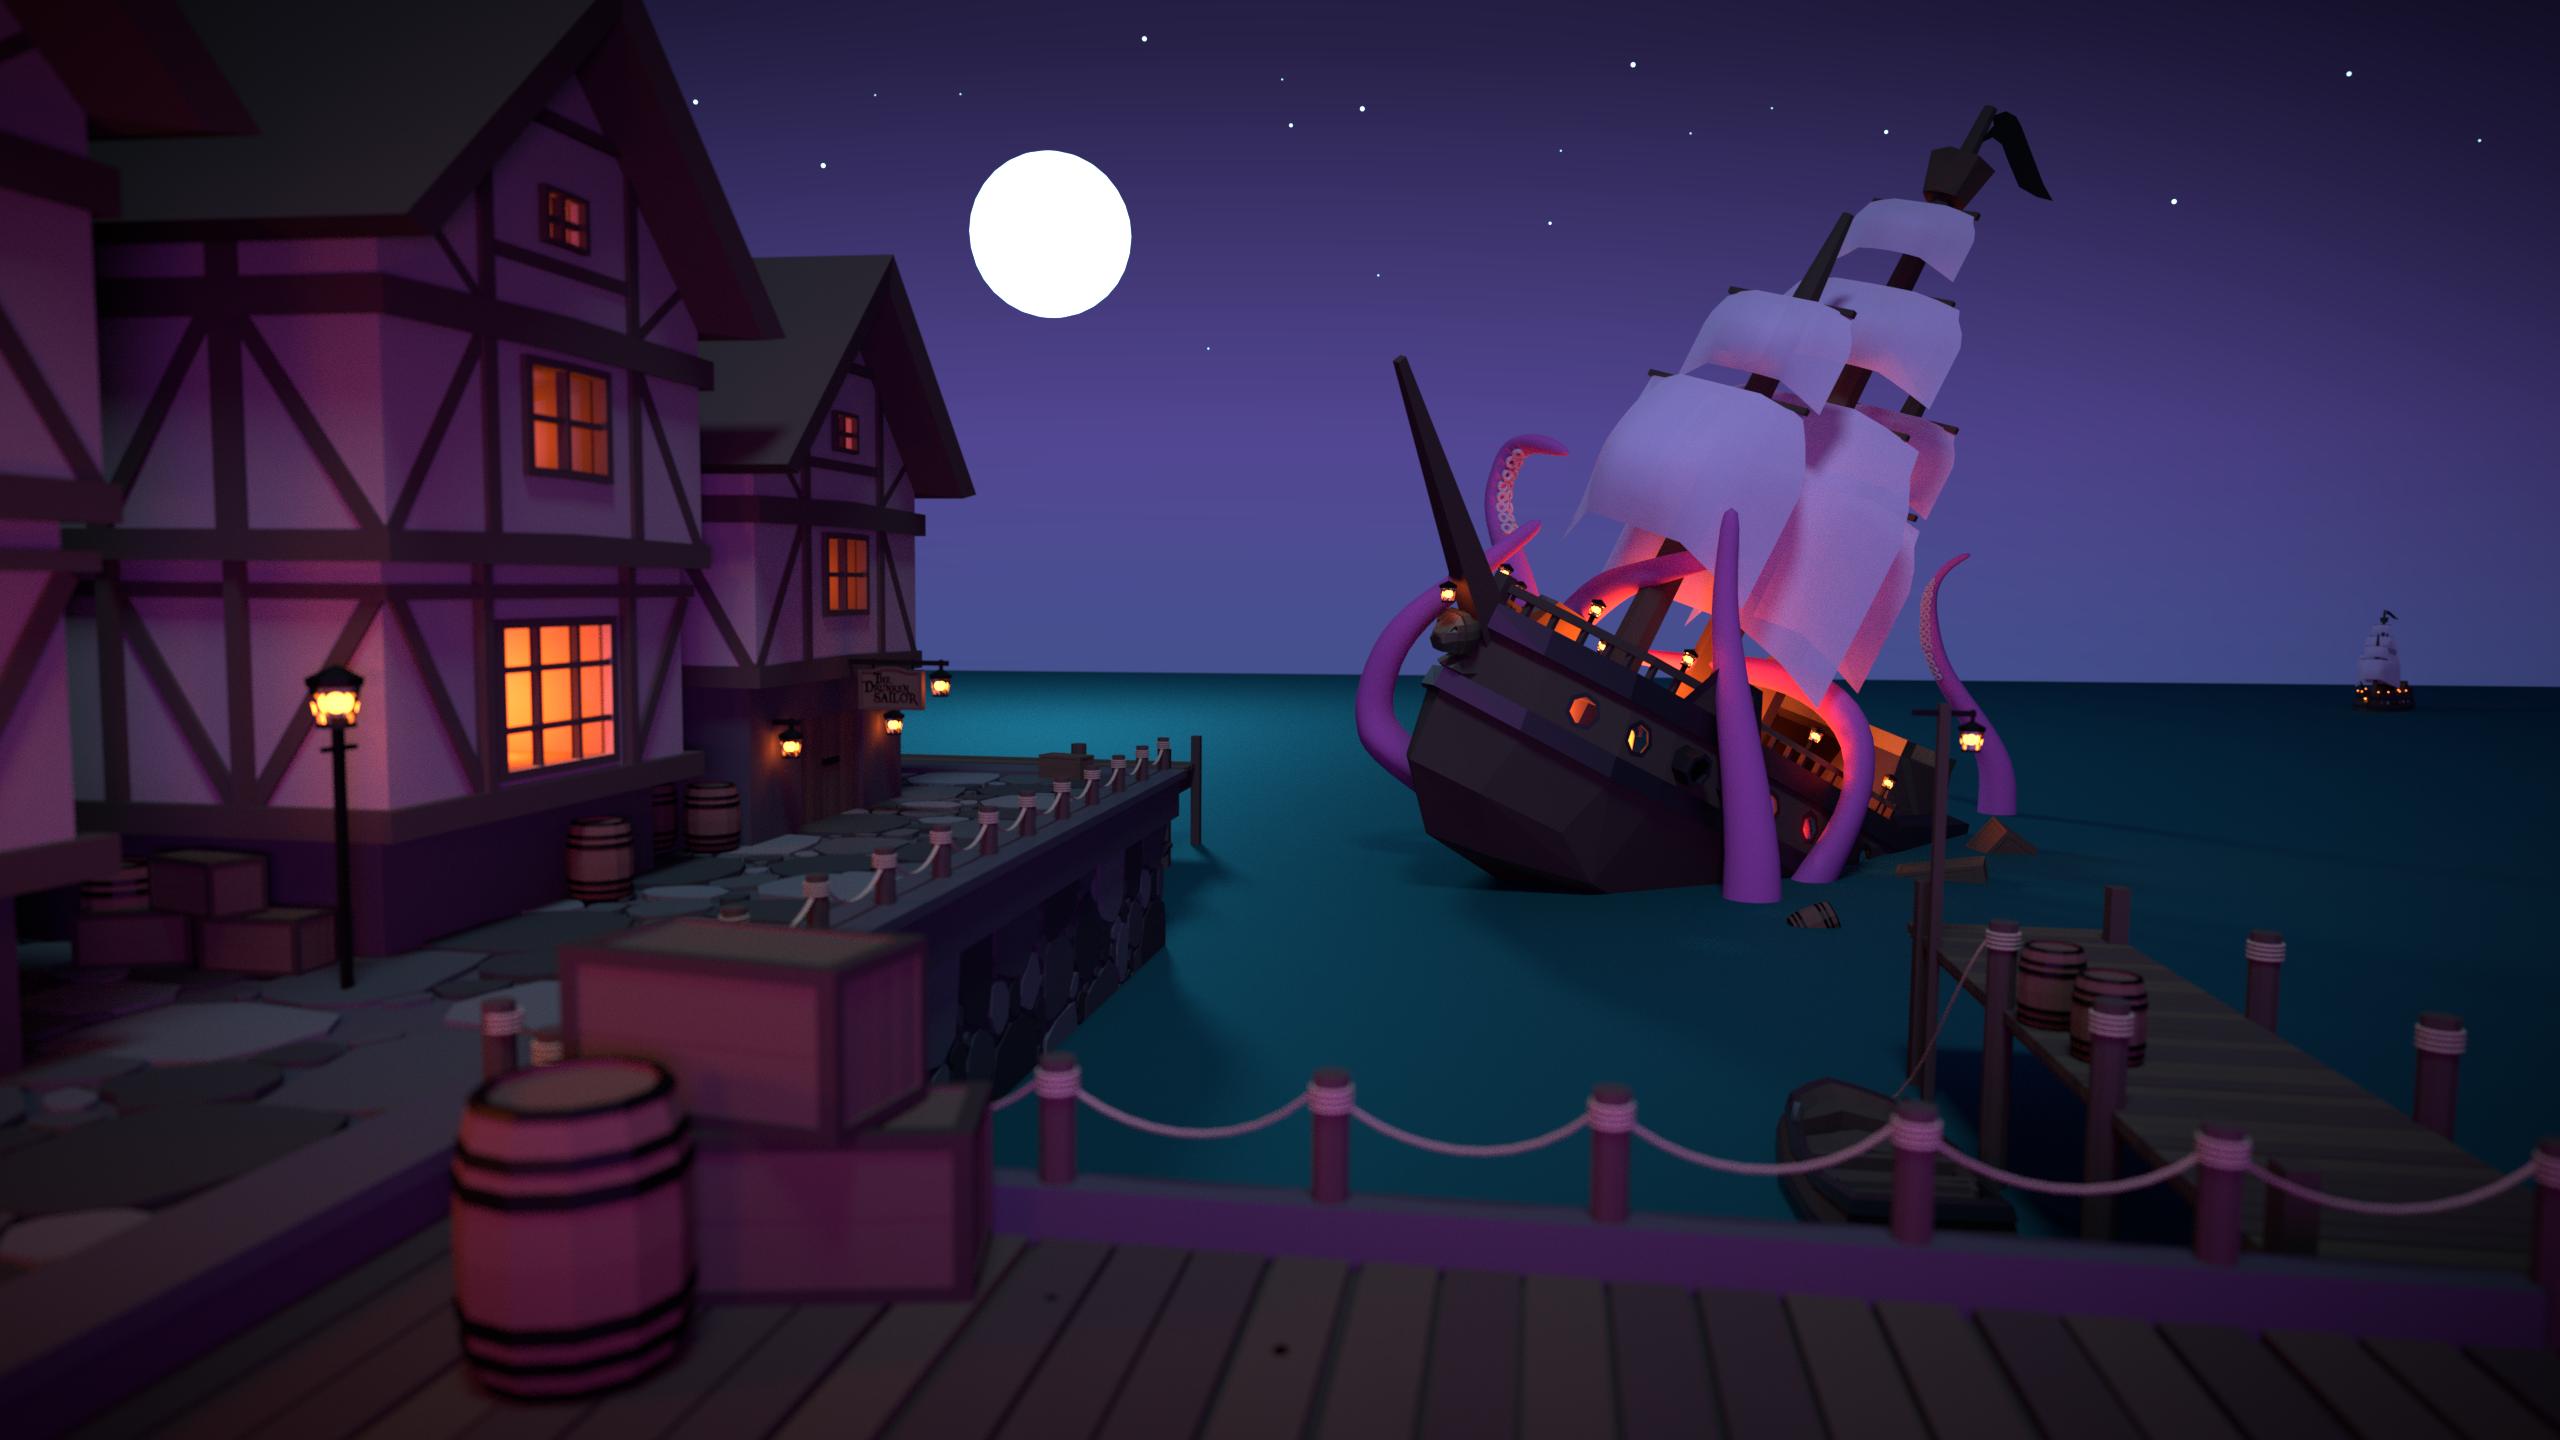 Wallpaper Digital Art Sailing Ship Sea Monsters Tentacles